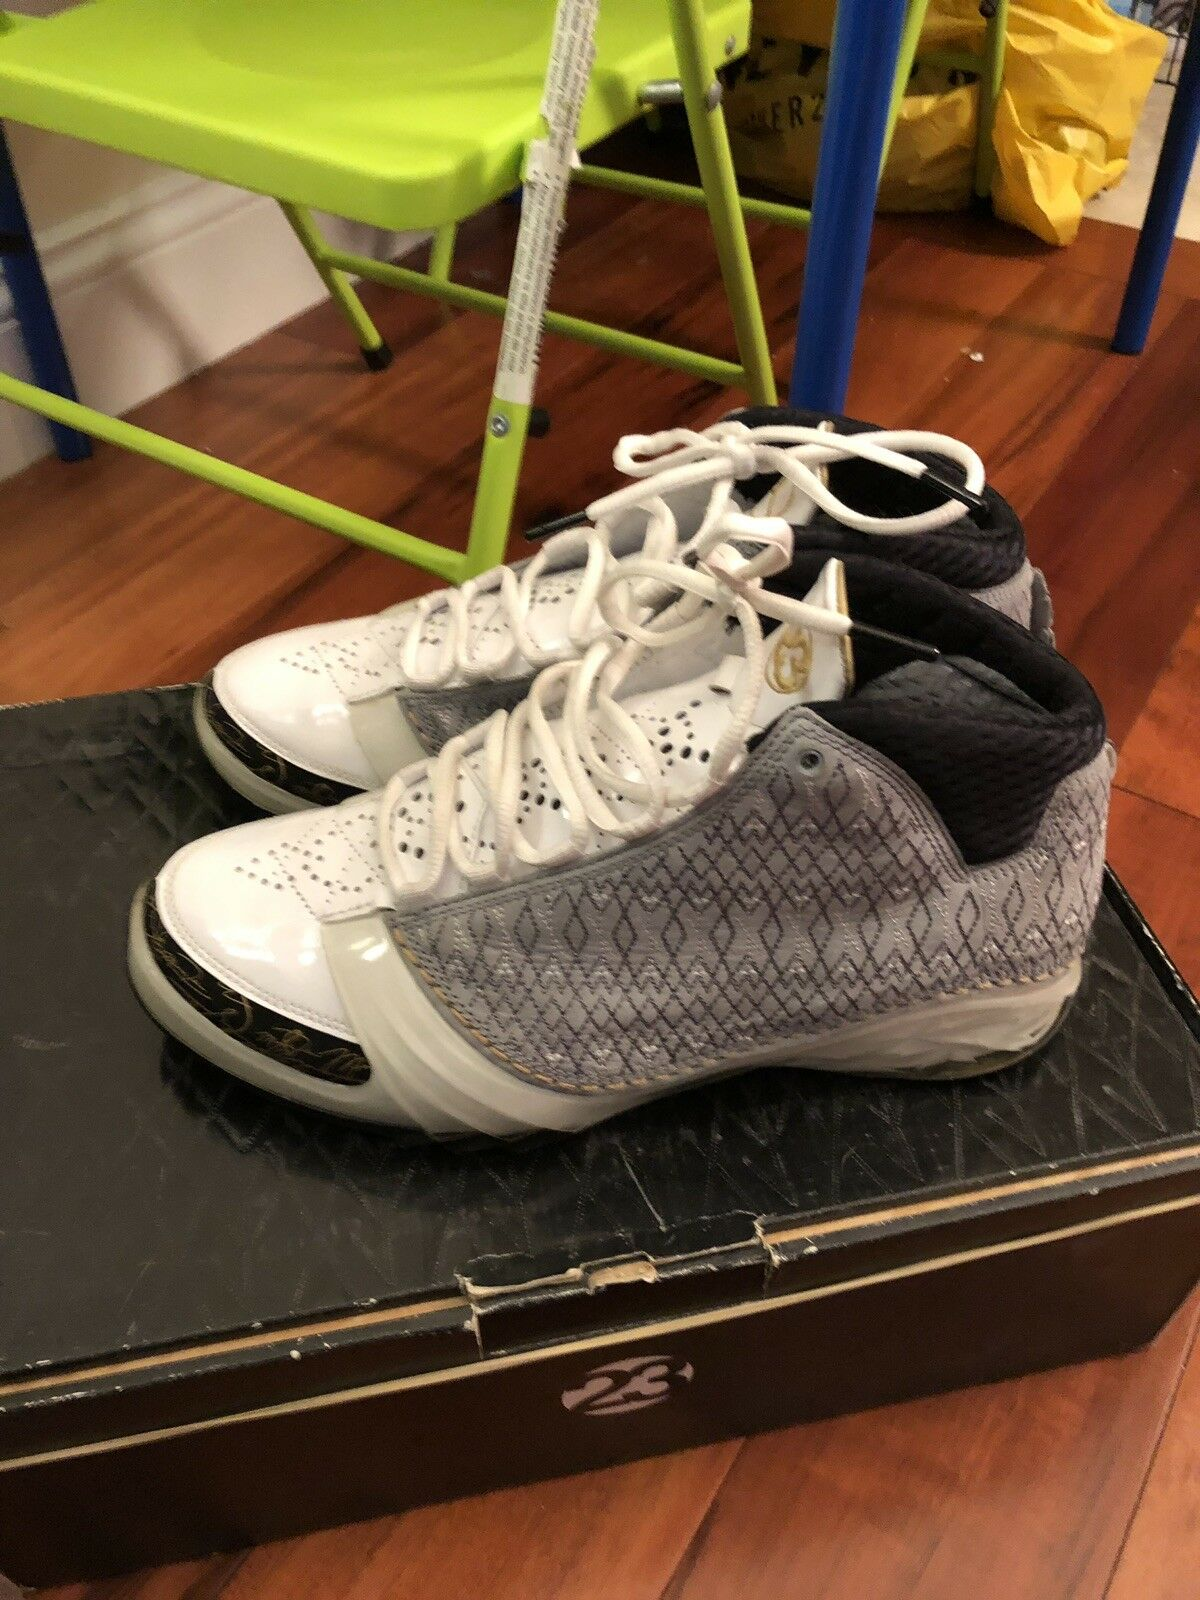 Air Jordan xx3 23 White Stealth Metallic gold 318376 102 Size 10